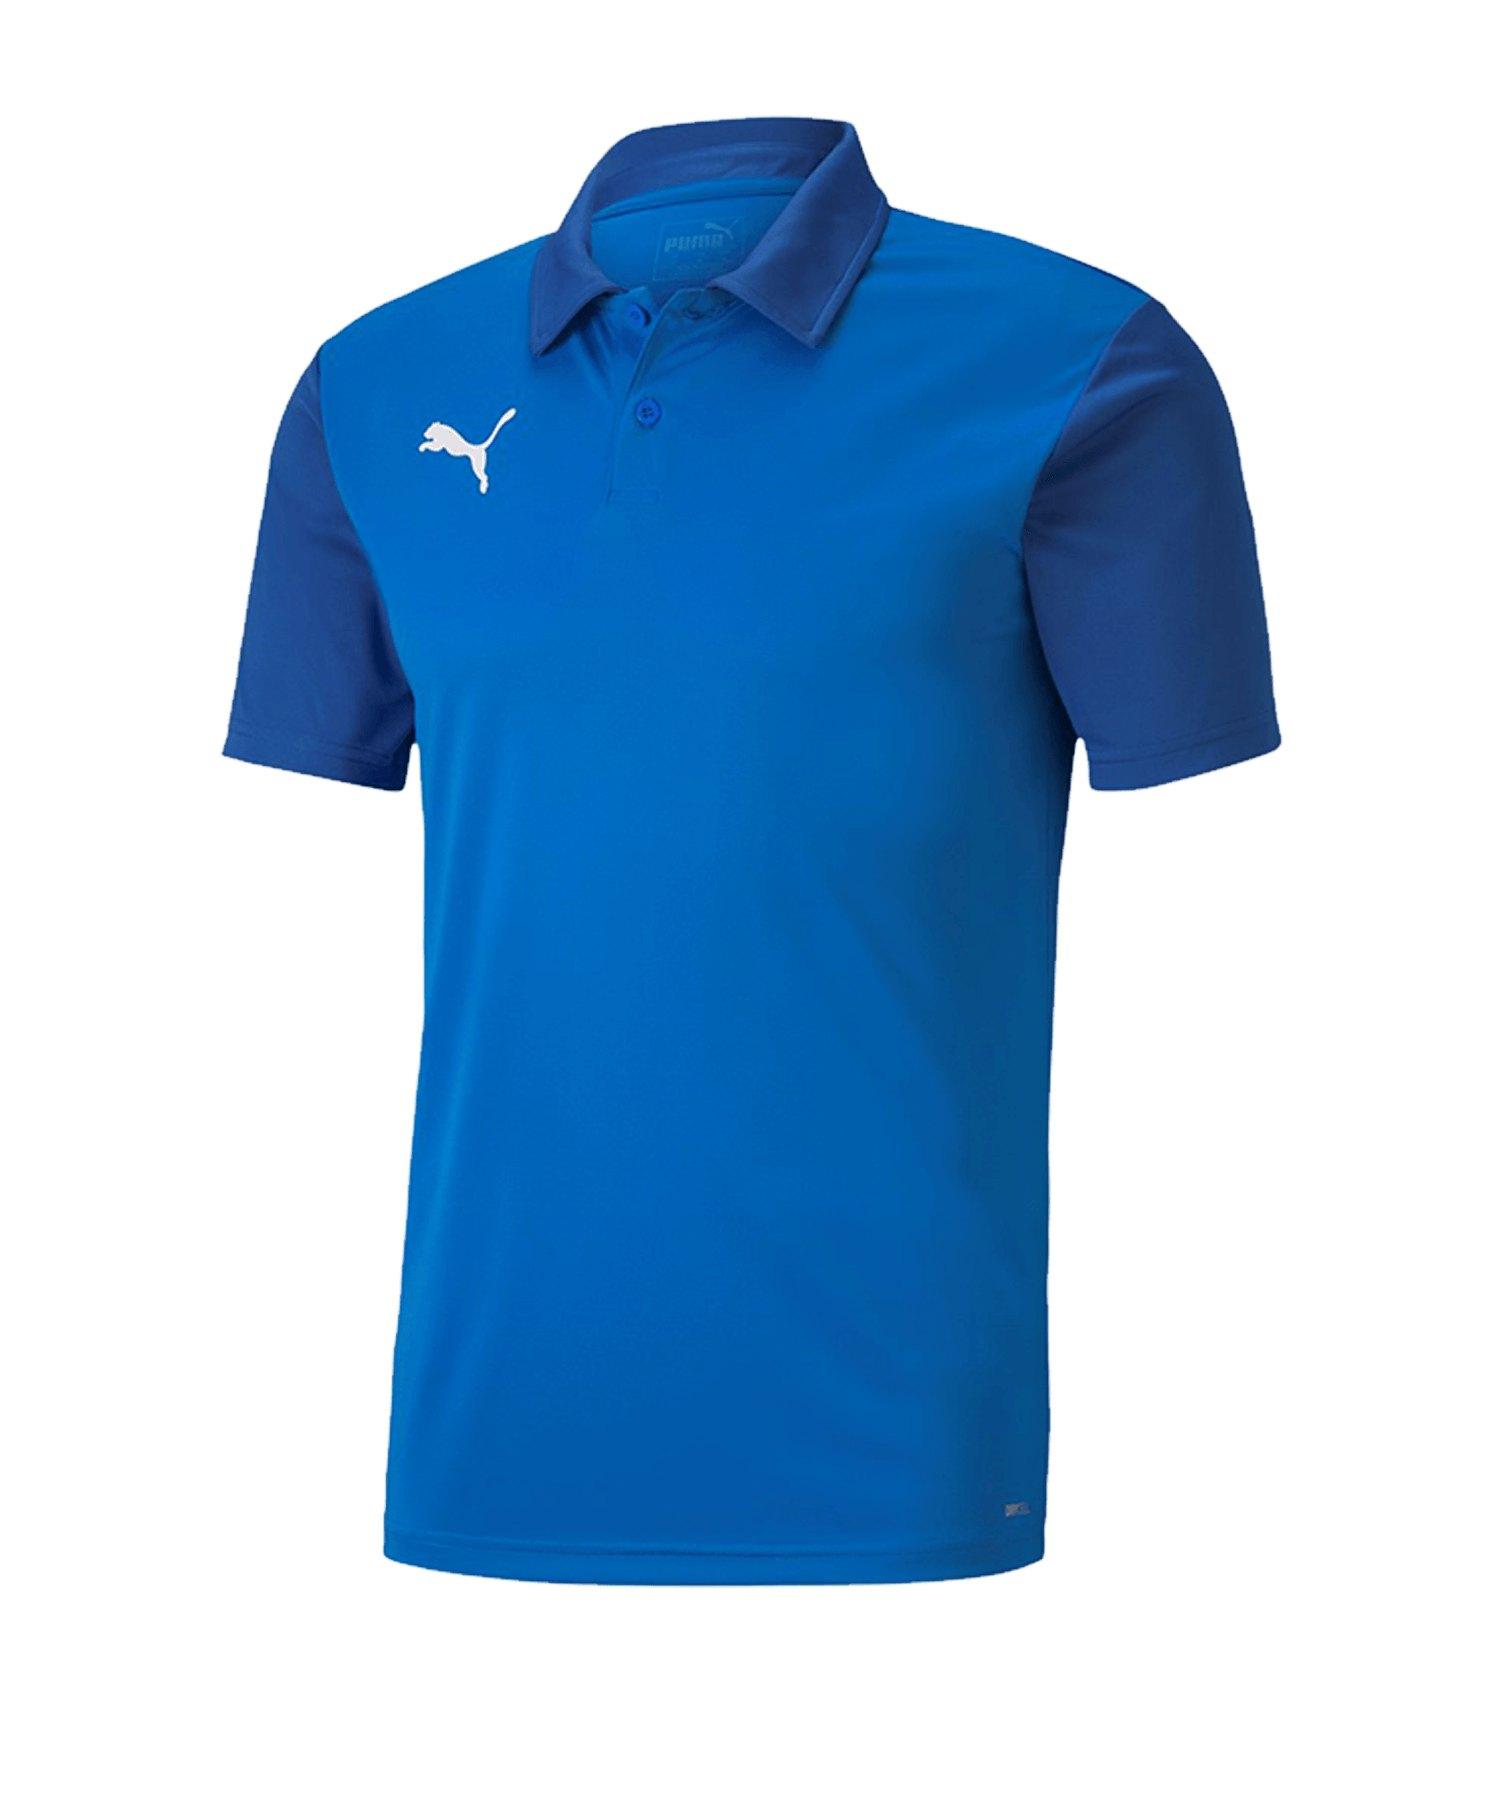 PUMA teamGOAL 23 Sideline Poloshirt Blau F02 - blau